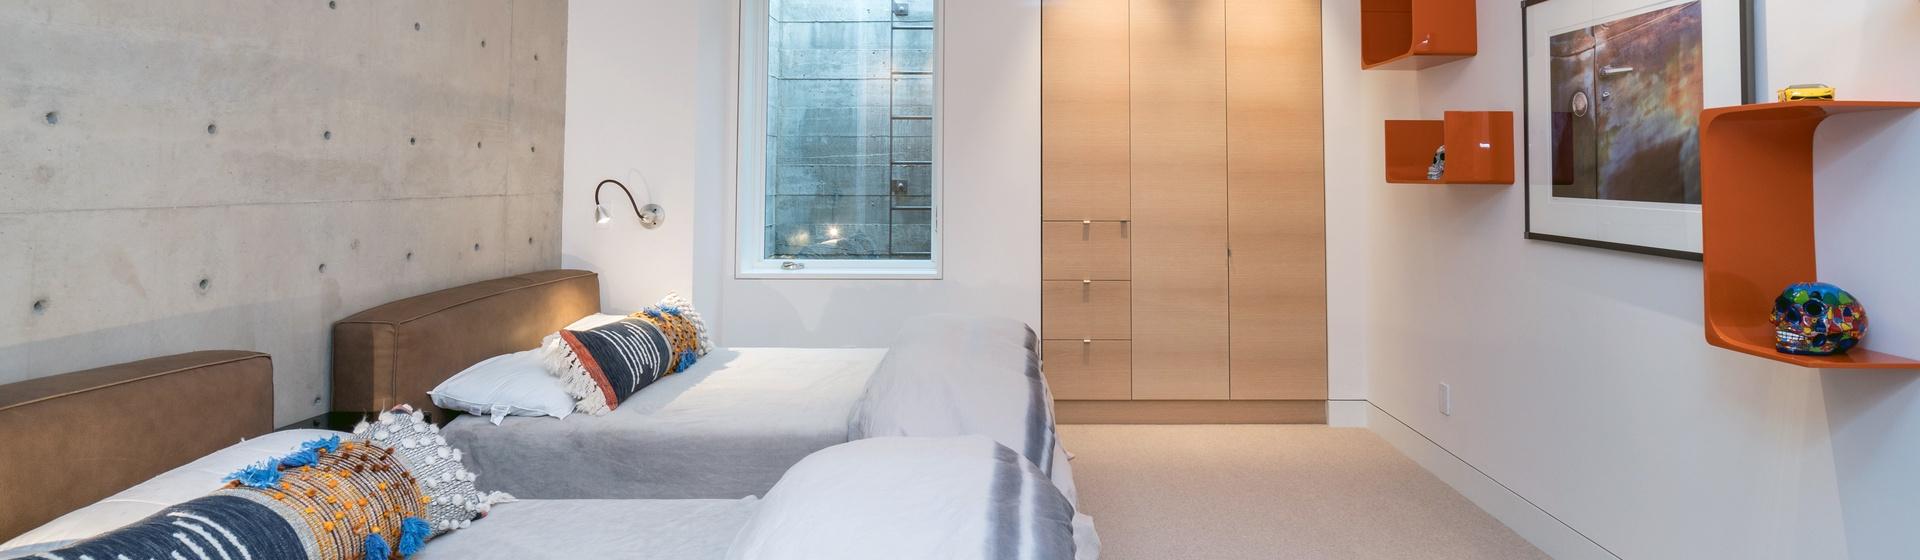 28-Telluride-The-Sunnyside-Downstairs-2-Full-Guest-Bedroom-Web.jpg